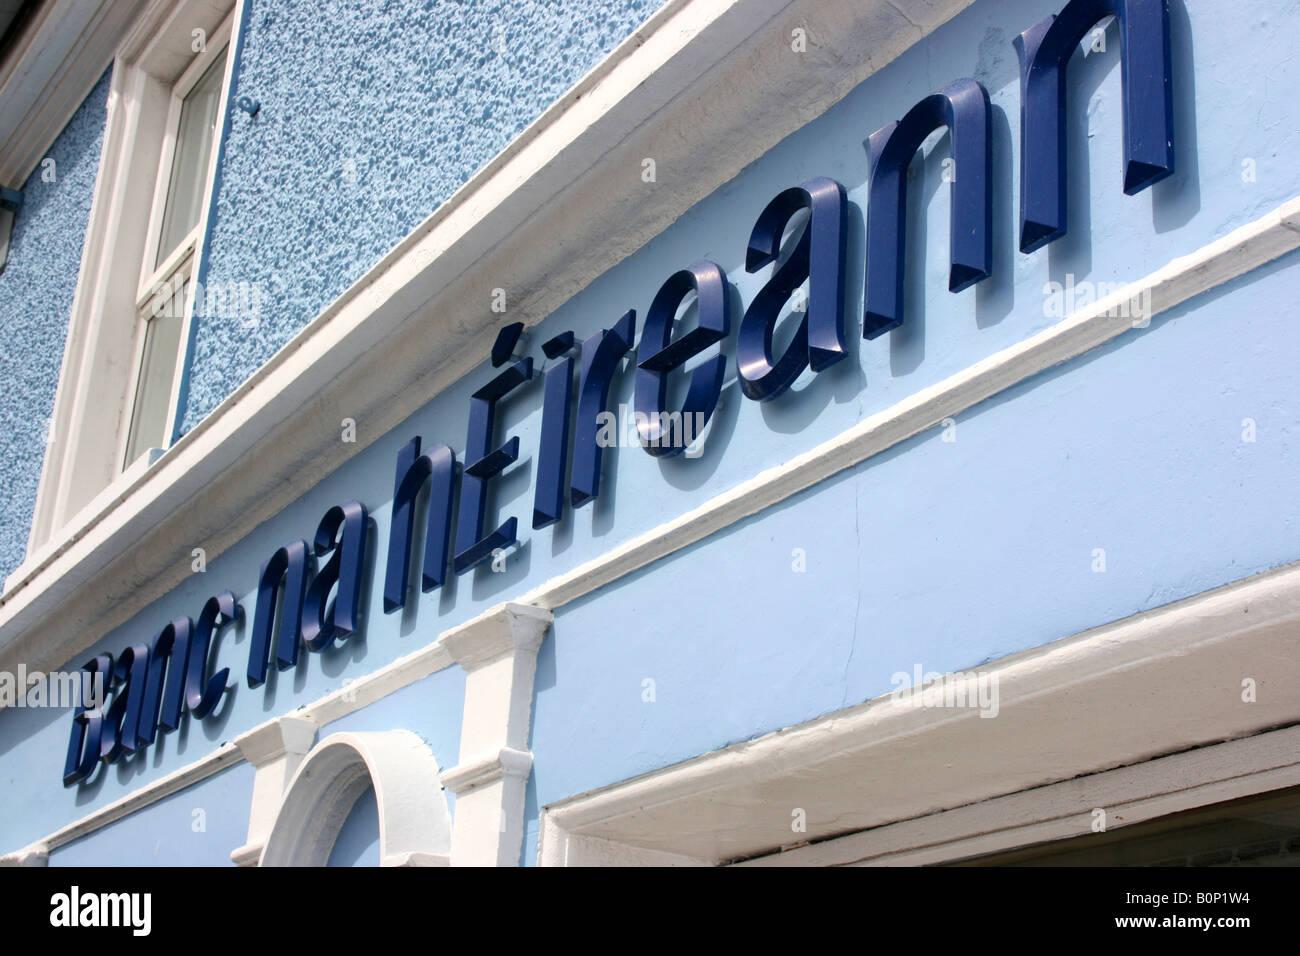 Banc na hÉireann - Bank of Ireland sign in Irish, Belmullet, County Mayo, Republic of Ireland - Stock Image